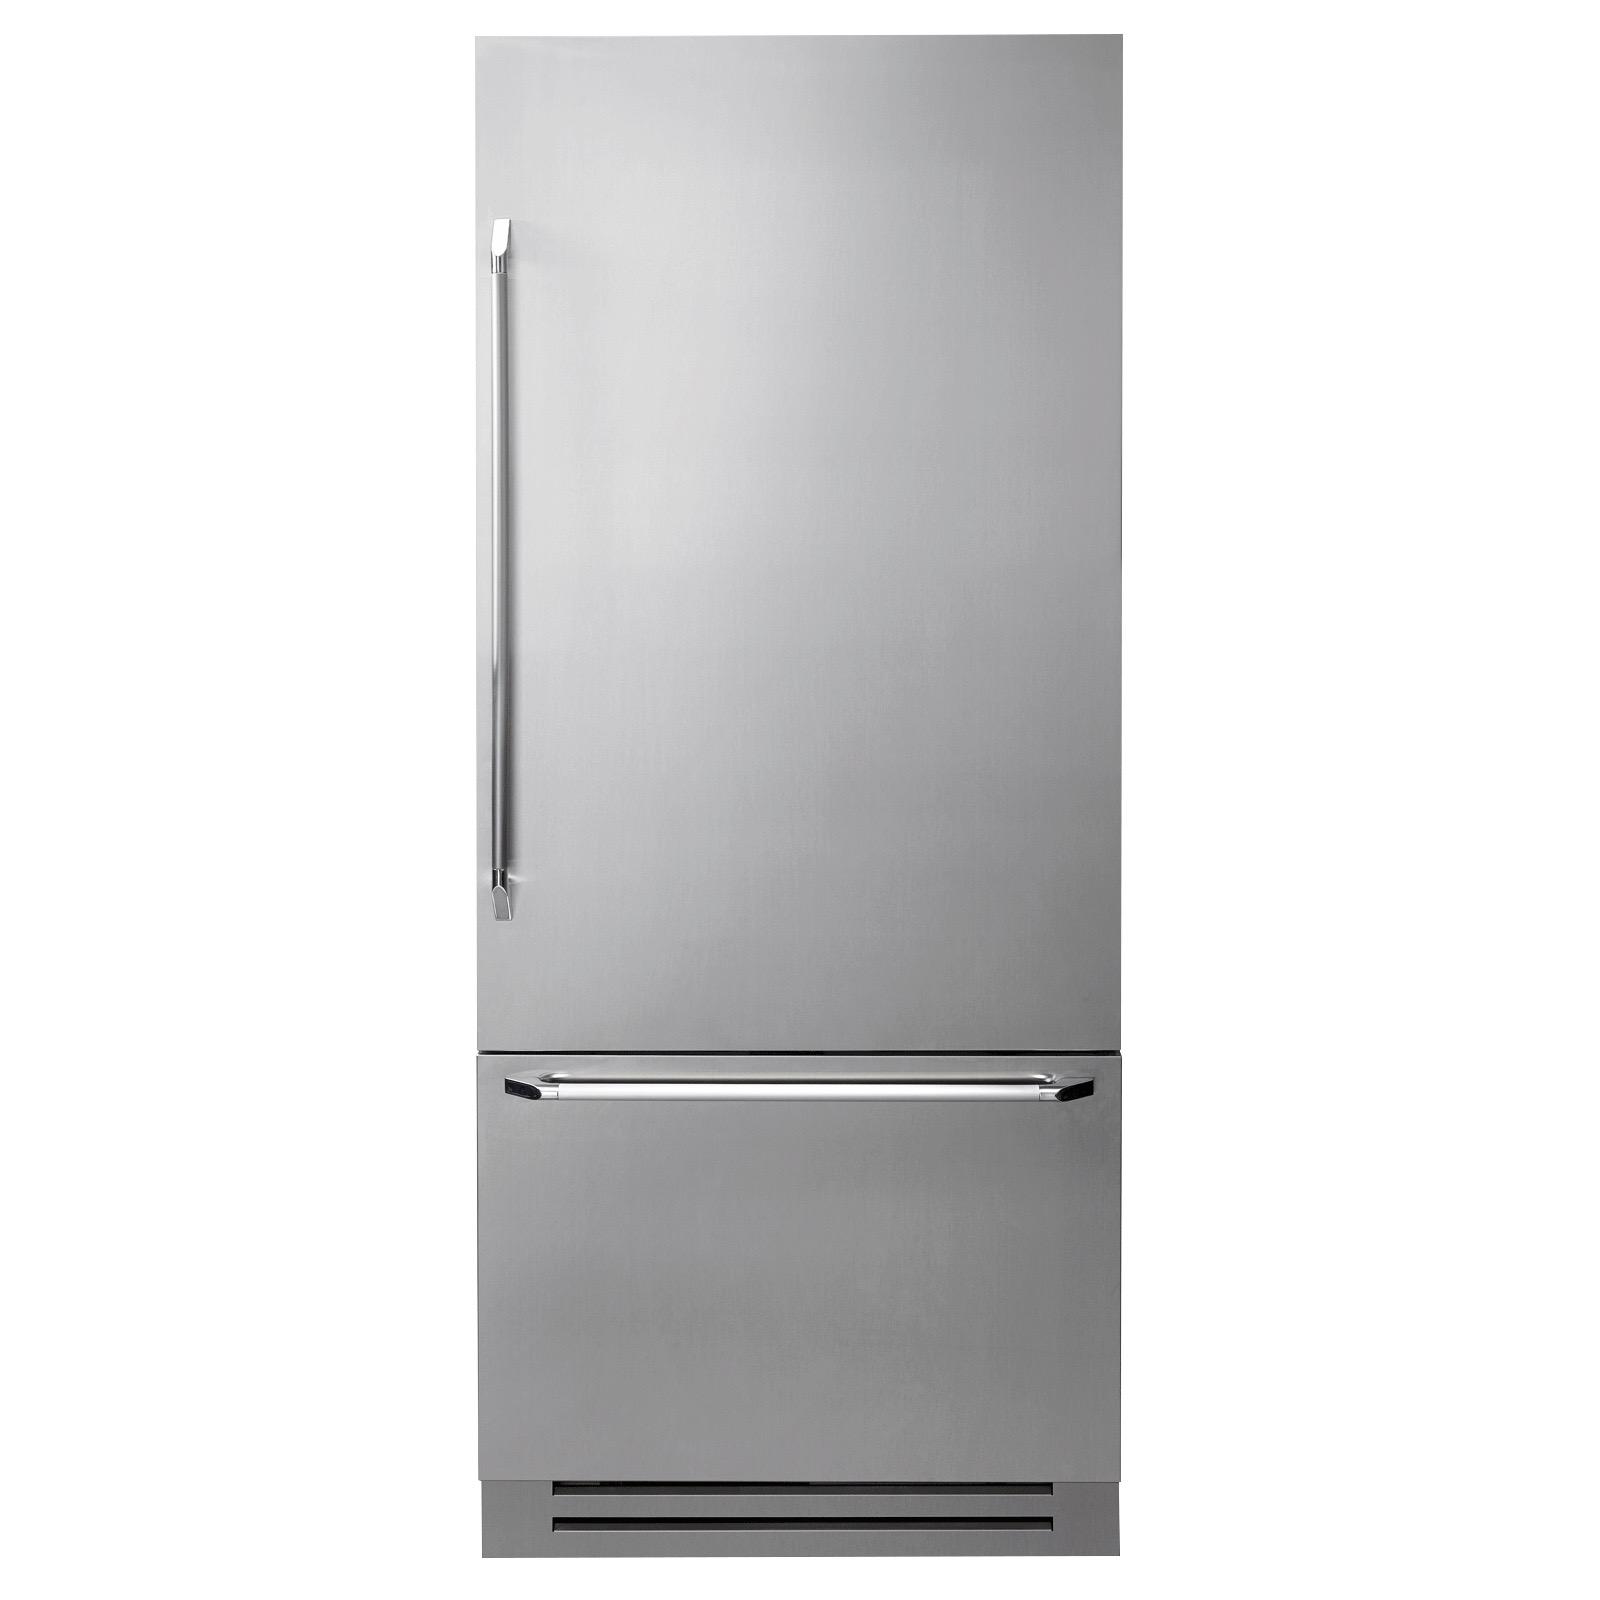 Refrigeration_Silos_DYF36BF_1600x1600_72dpi